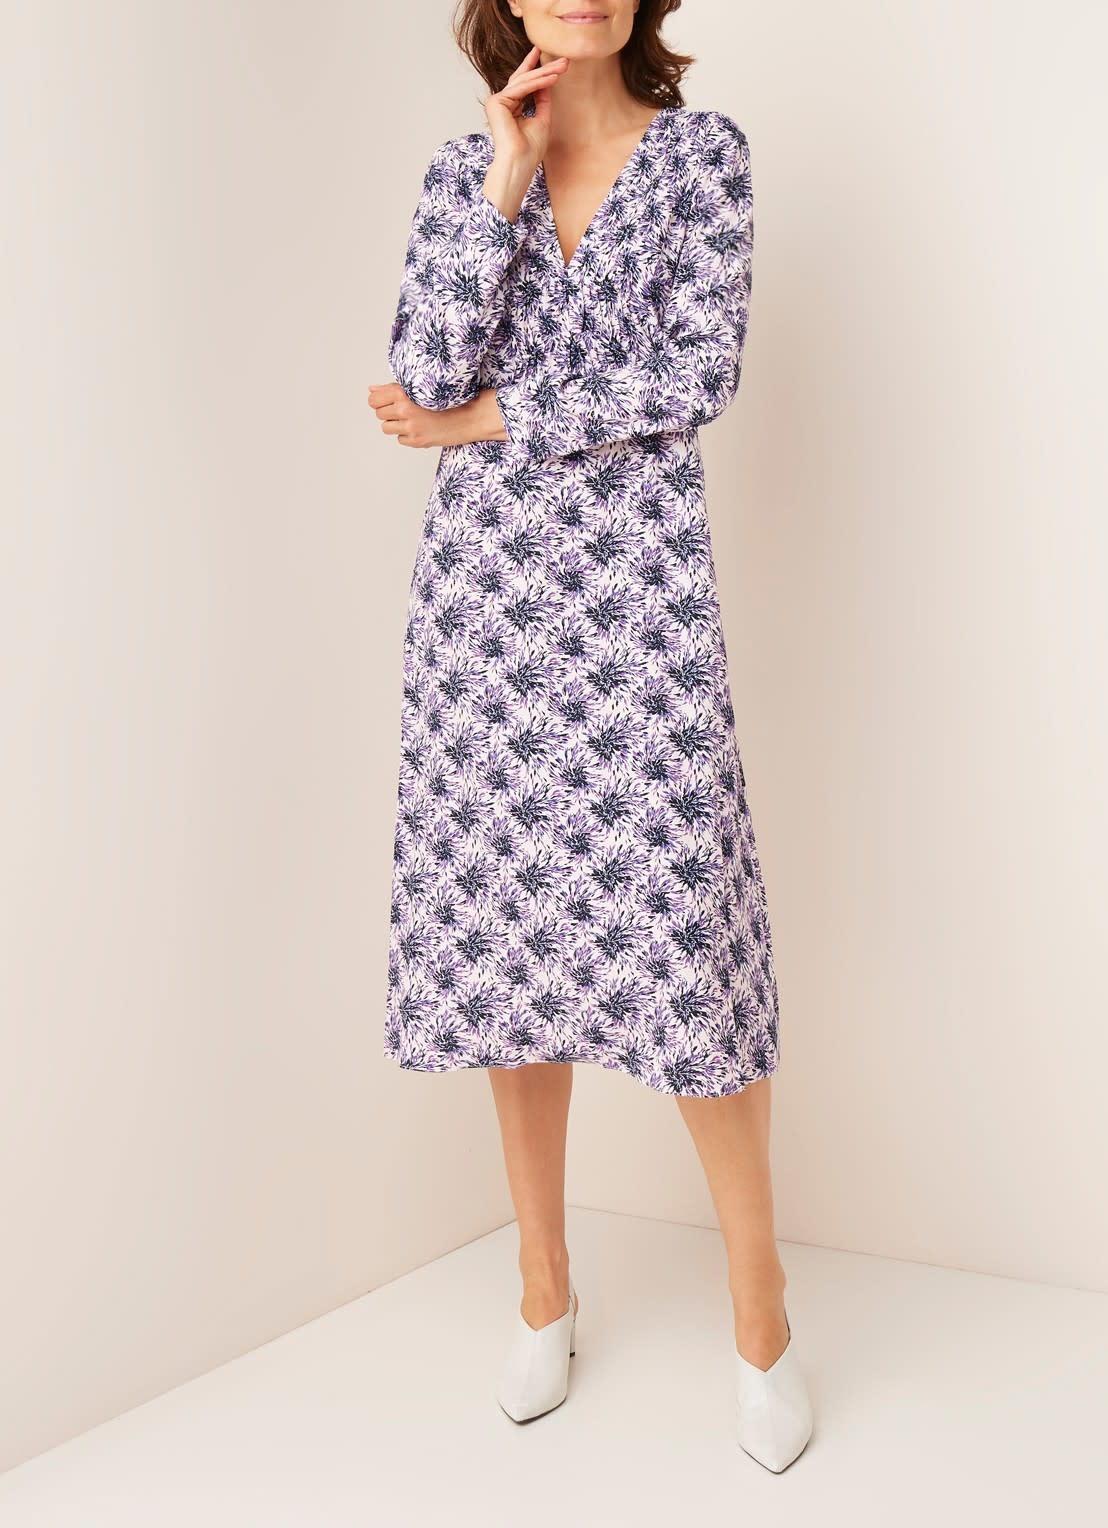 Micha dress by malene birger-2